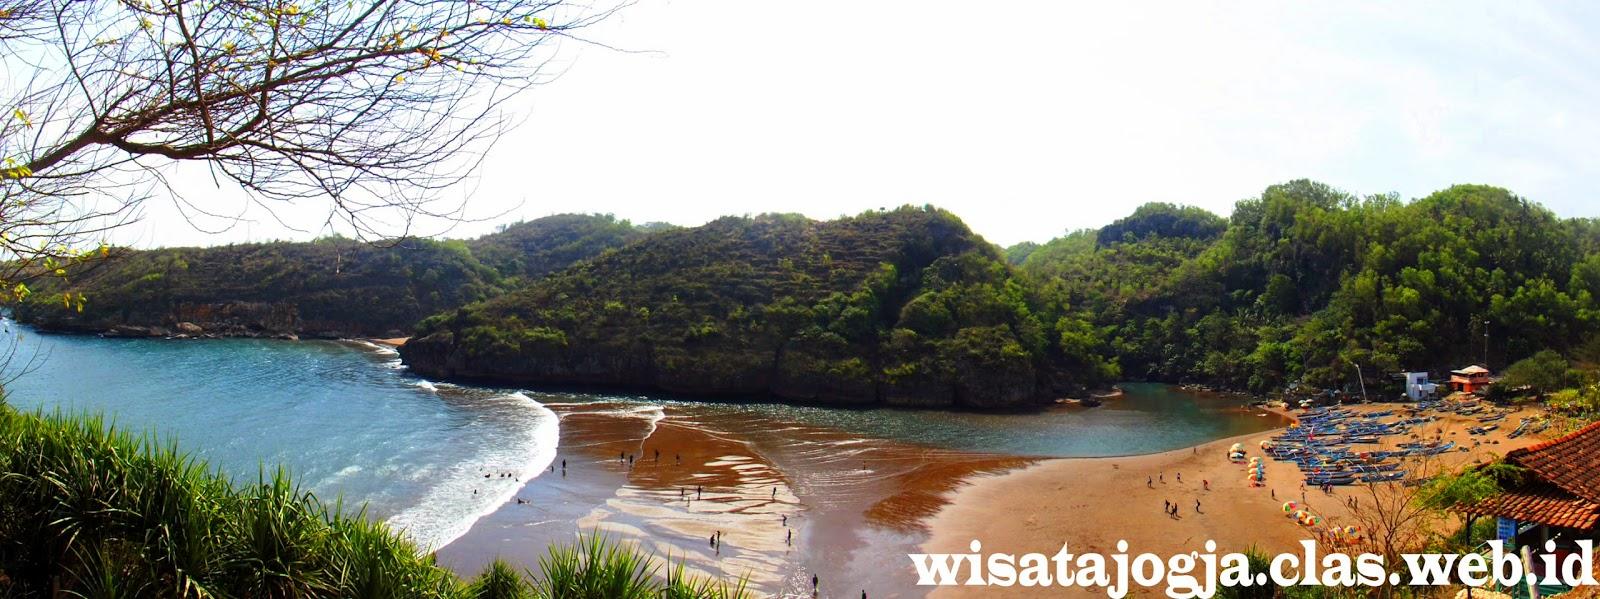 Wisata Pantai eksotis pantai Baron  di gunungkidul Yogyakarta selain pantai indrayant } iPantai Baron | wisata pantai yogyakarta |